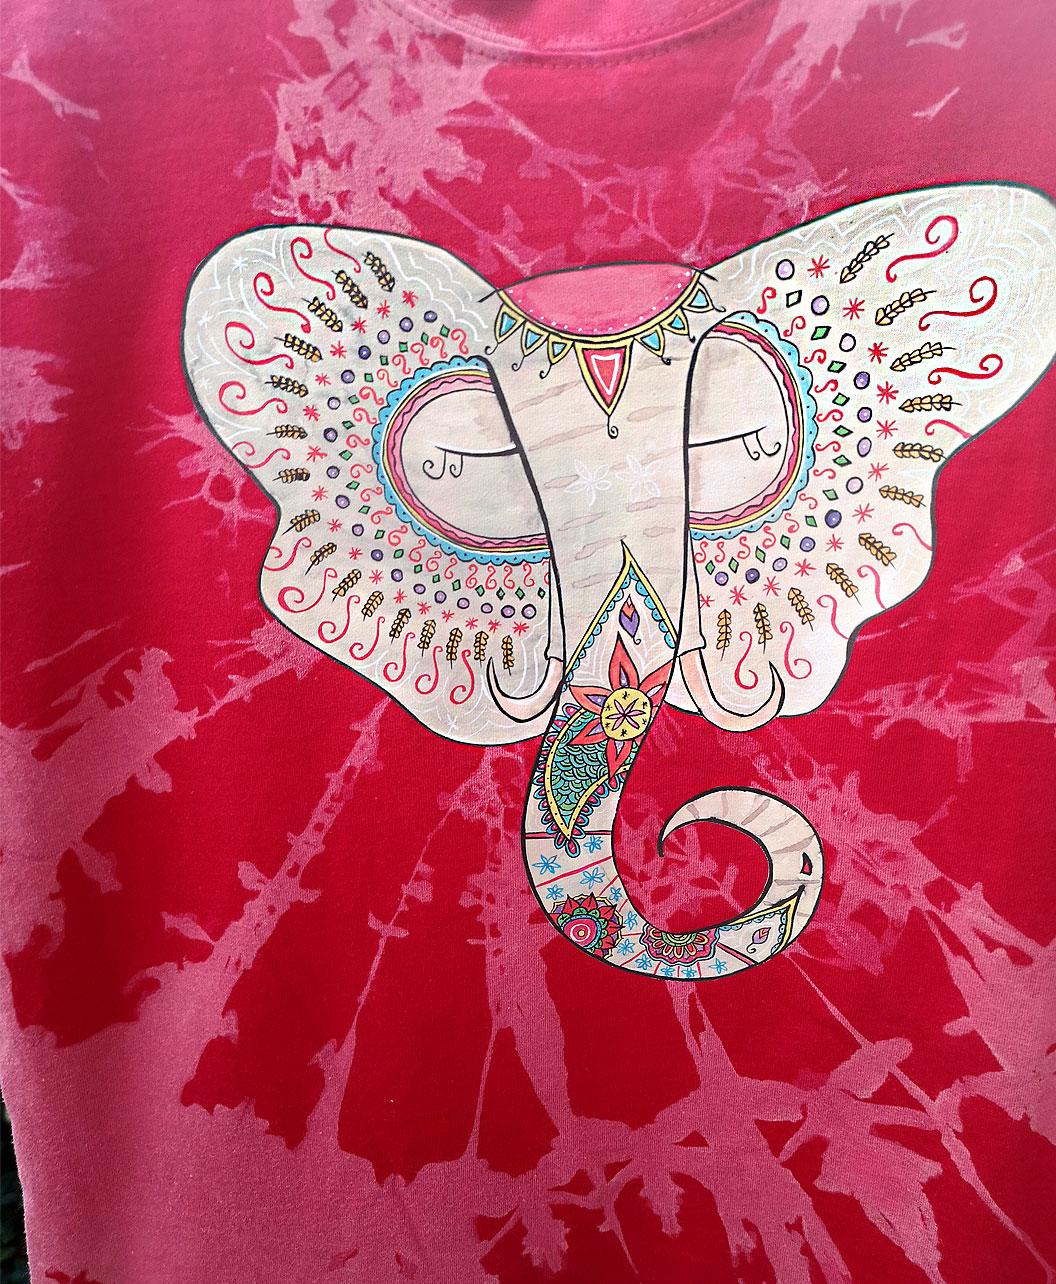 camiseta ninos tie dye roja divertida alegre ilustracion elefante indio